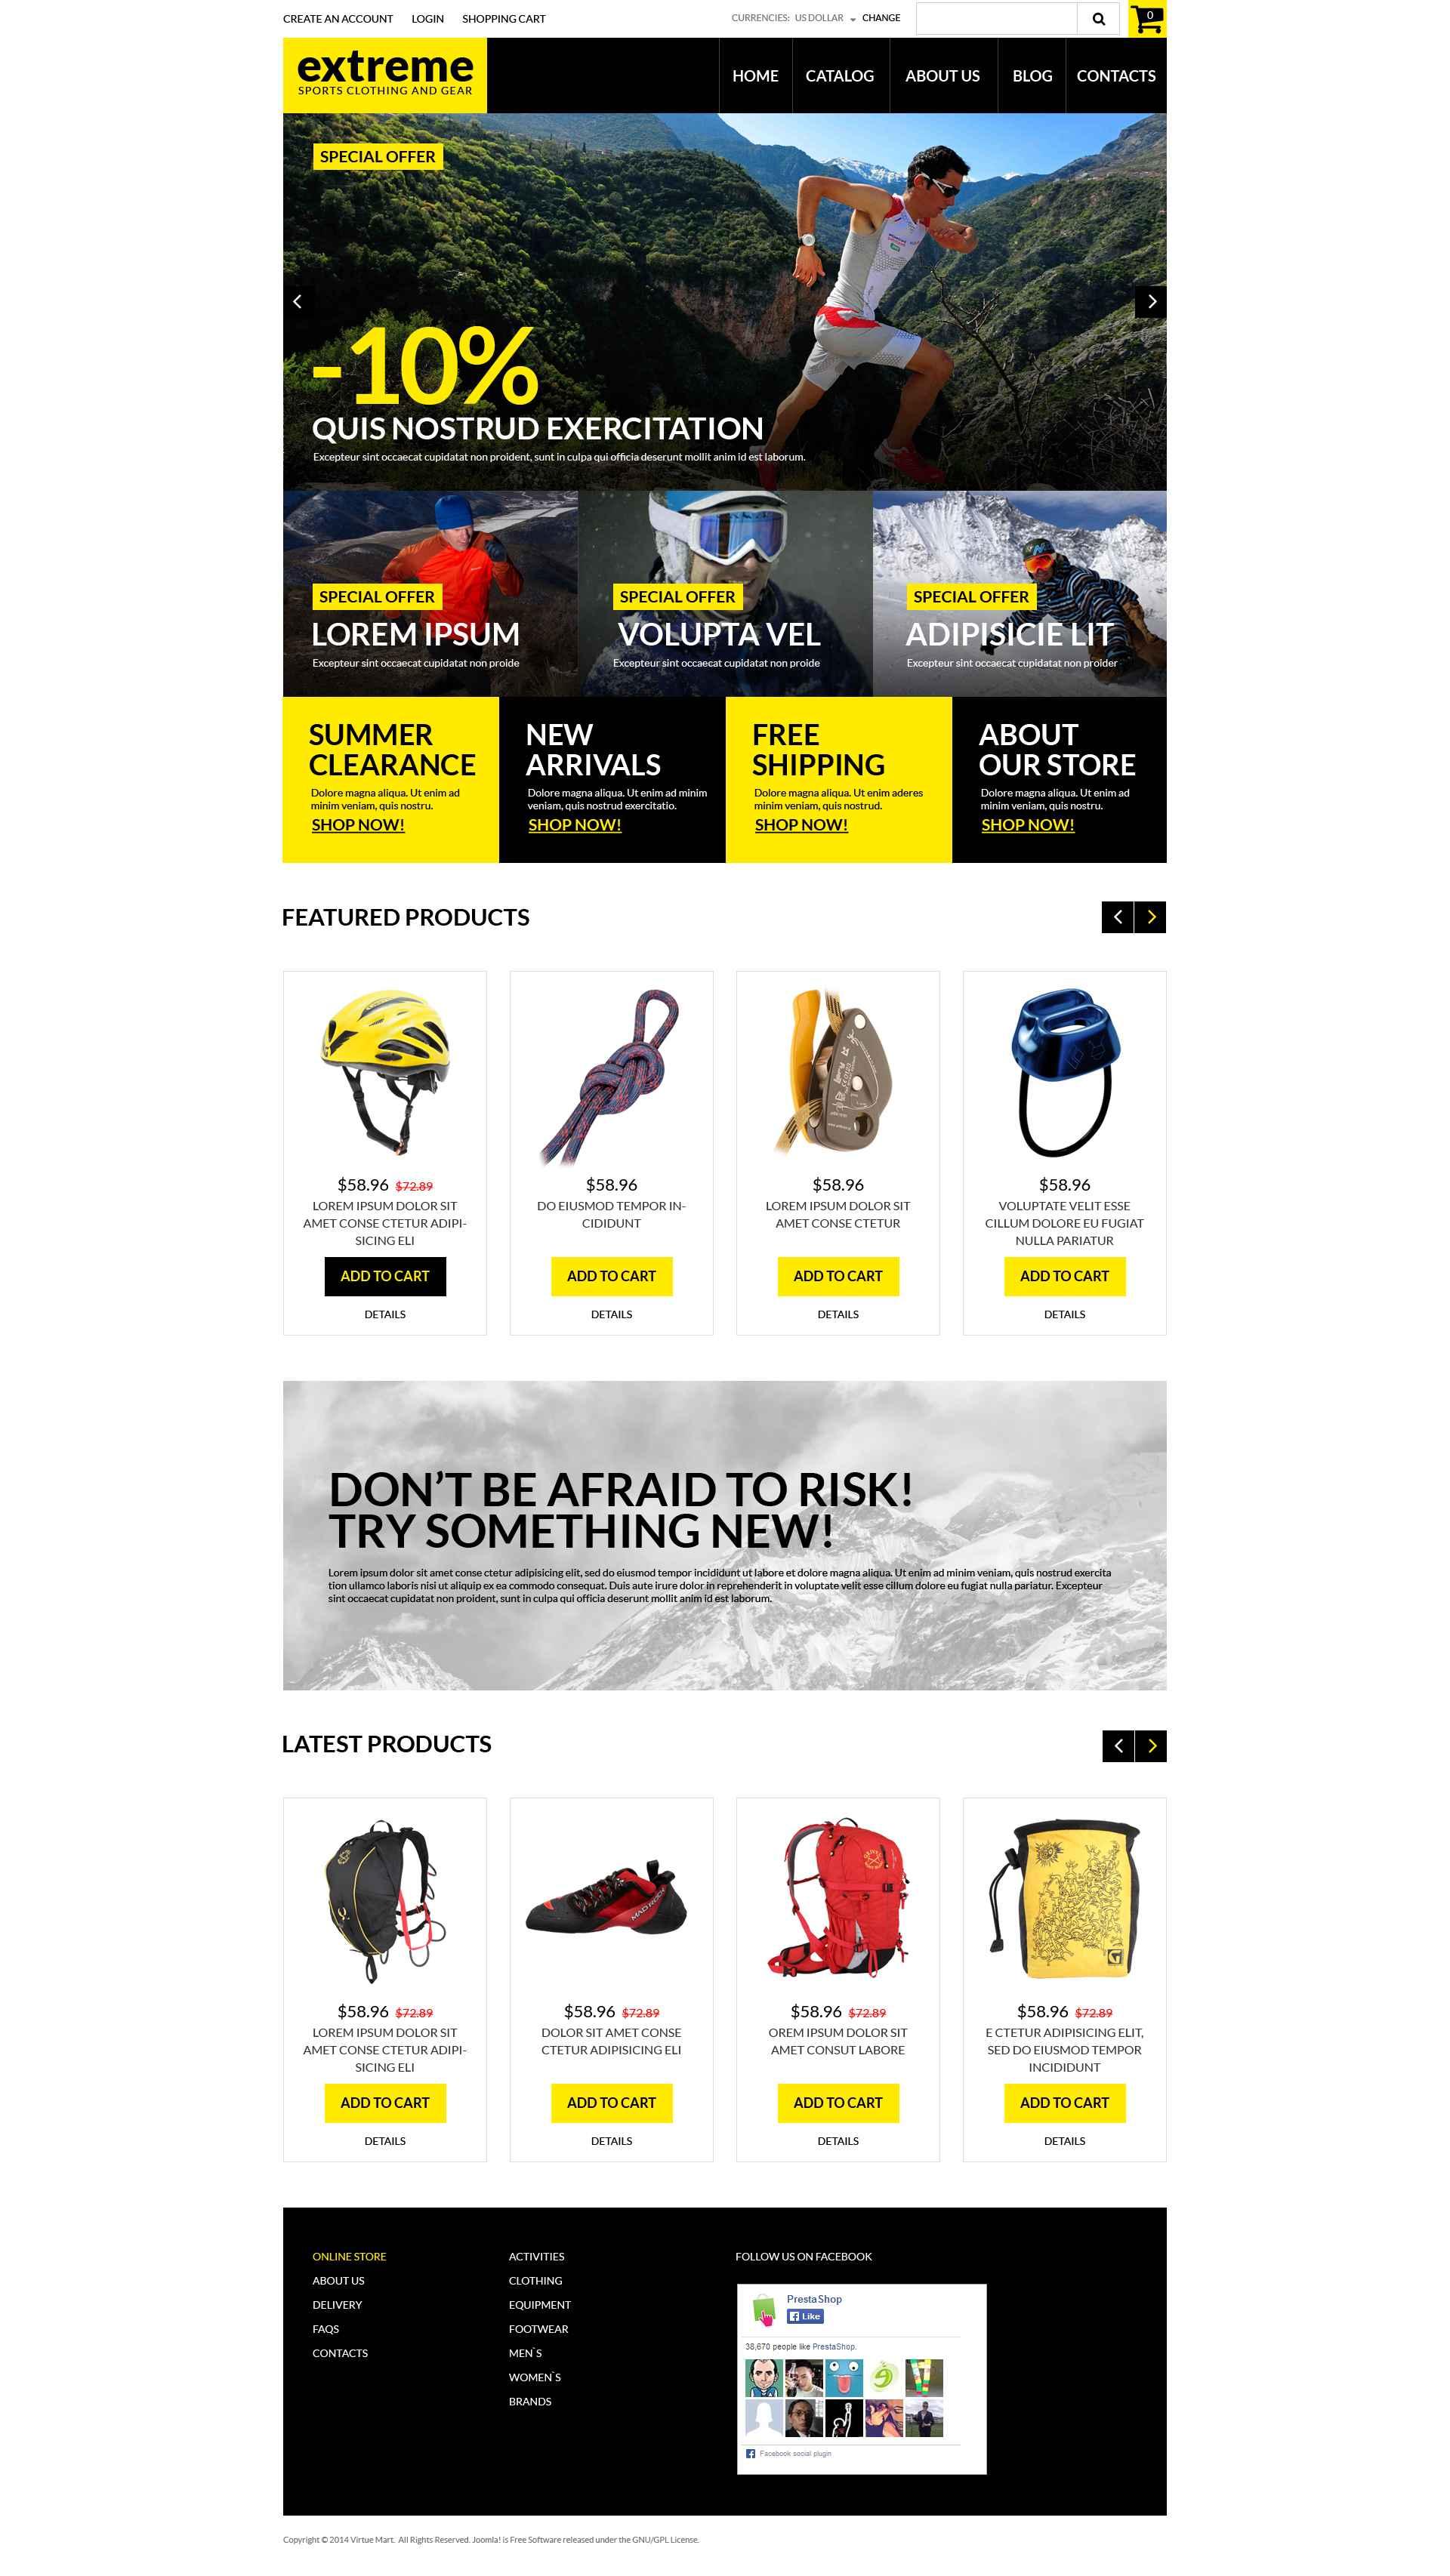 Szablon VirtueMart Risk Takers Clothing  Gear #51976 - zrzut ekranu